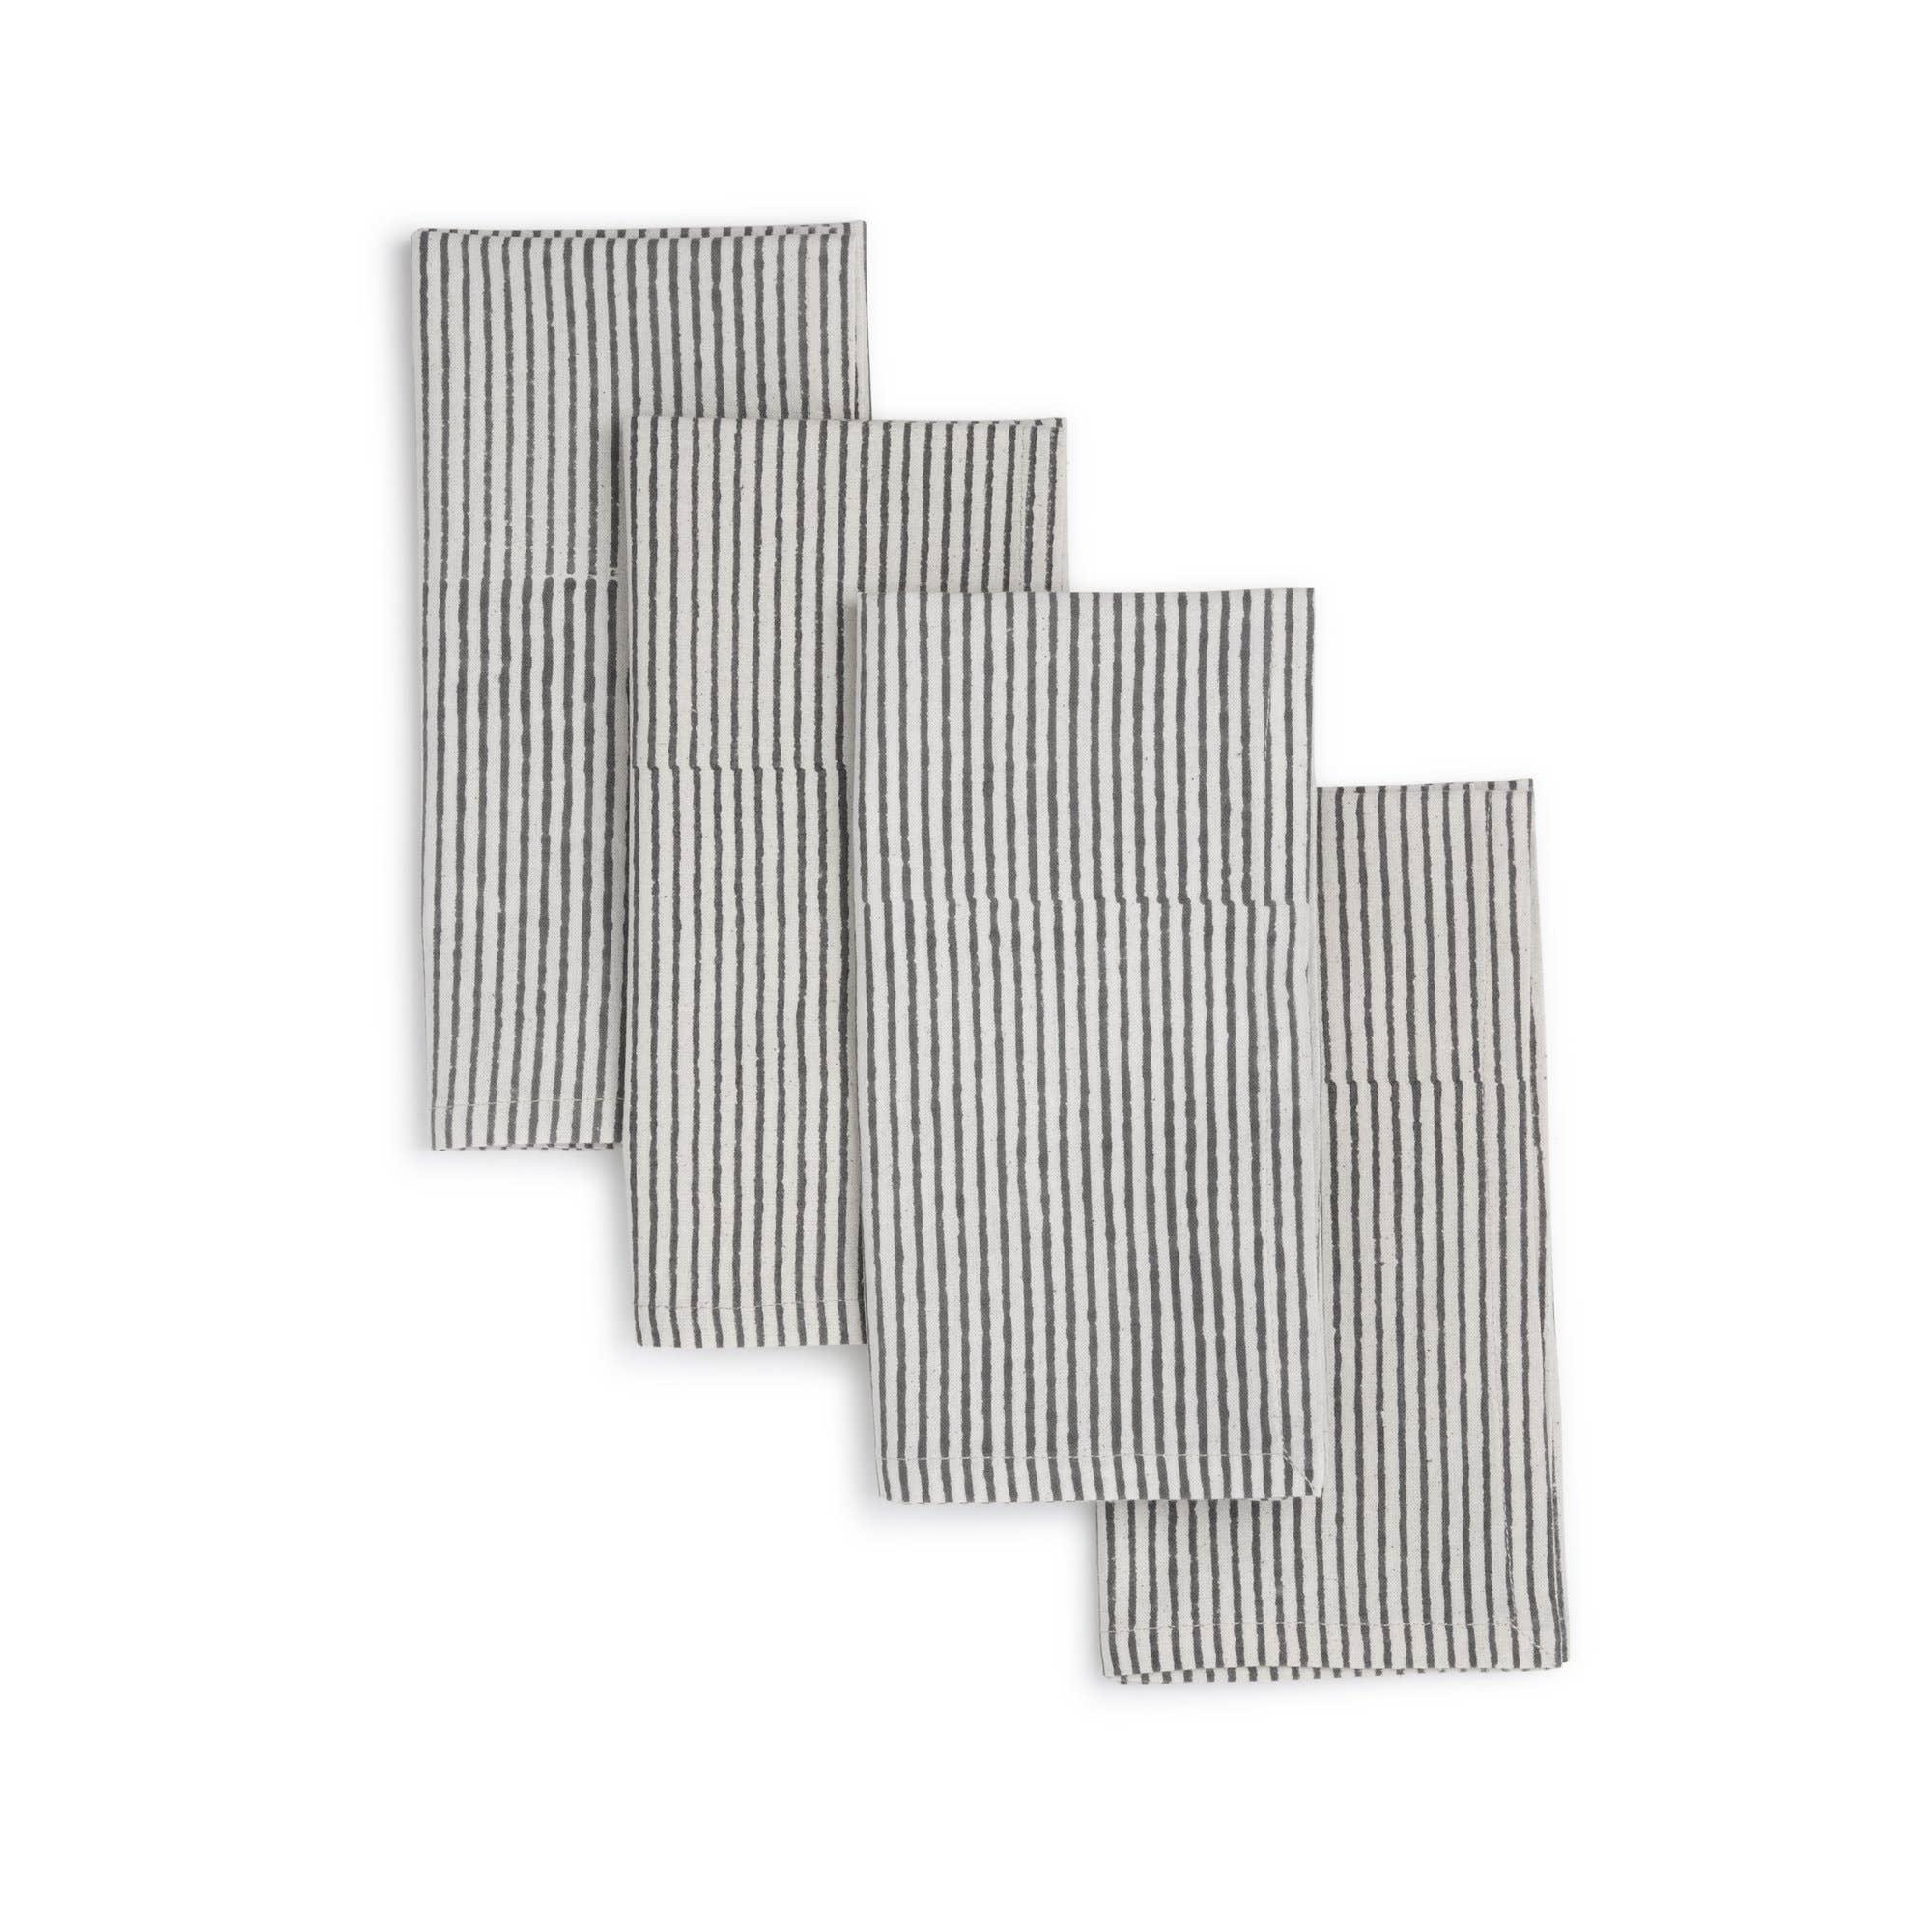 NIGHT SKY Napkin  (set of 4), Hand Block Printed Cotton | Trada Marketplace